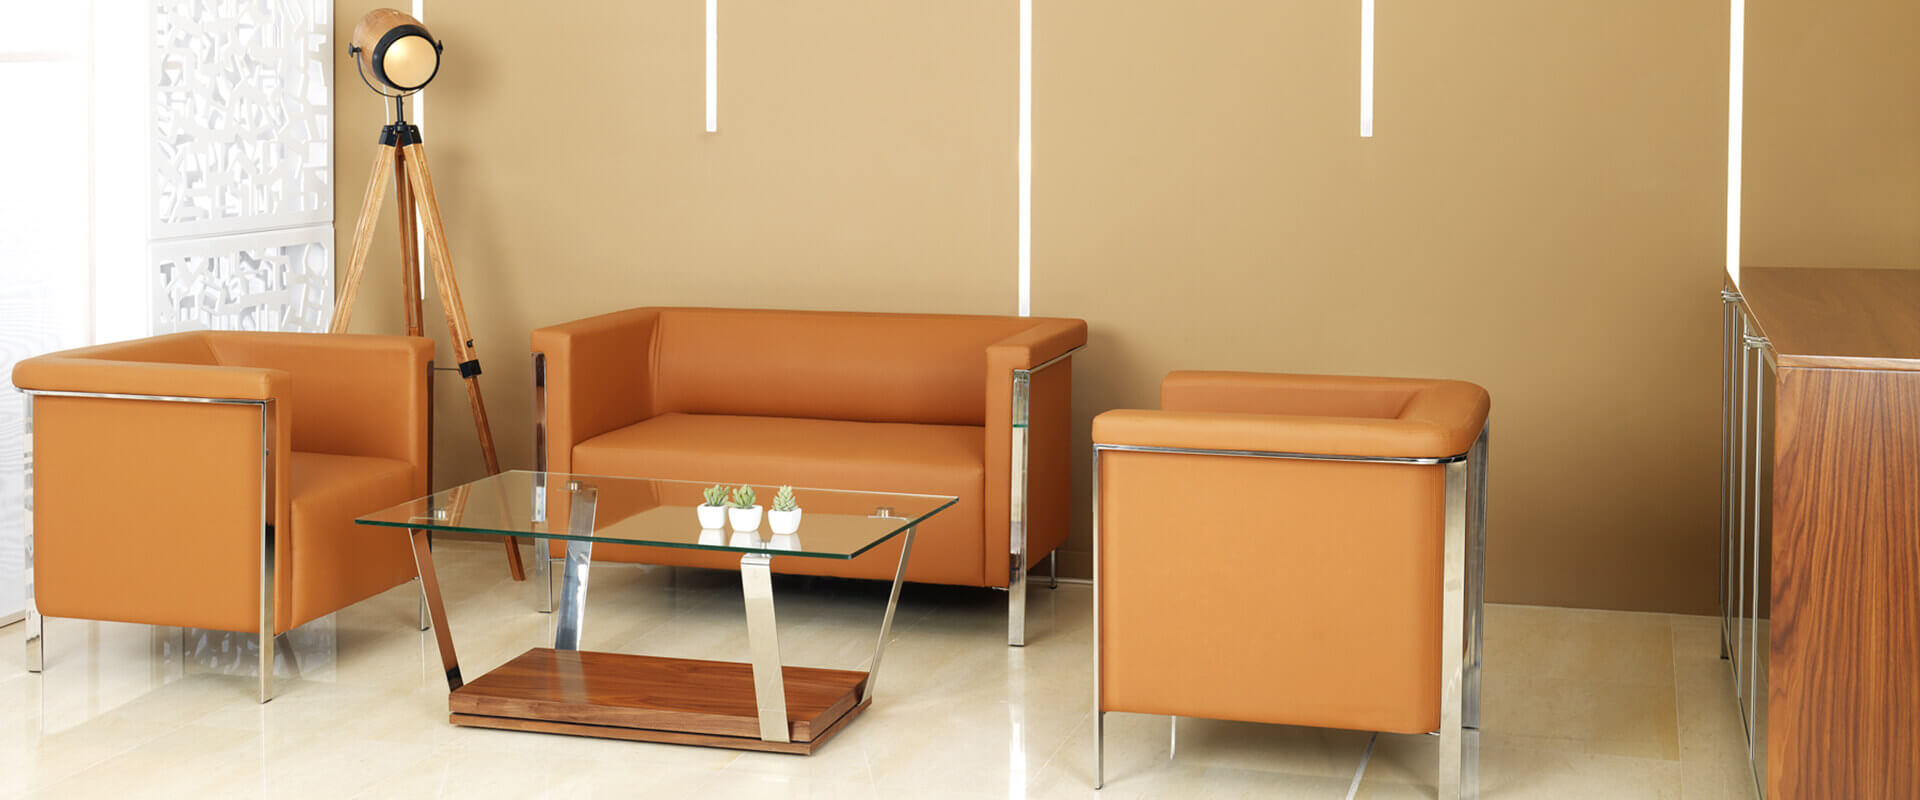 Meuble mezghani meuble mezghani for Salon 5 etoiles tunisie